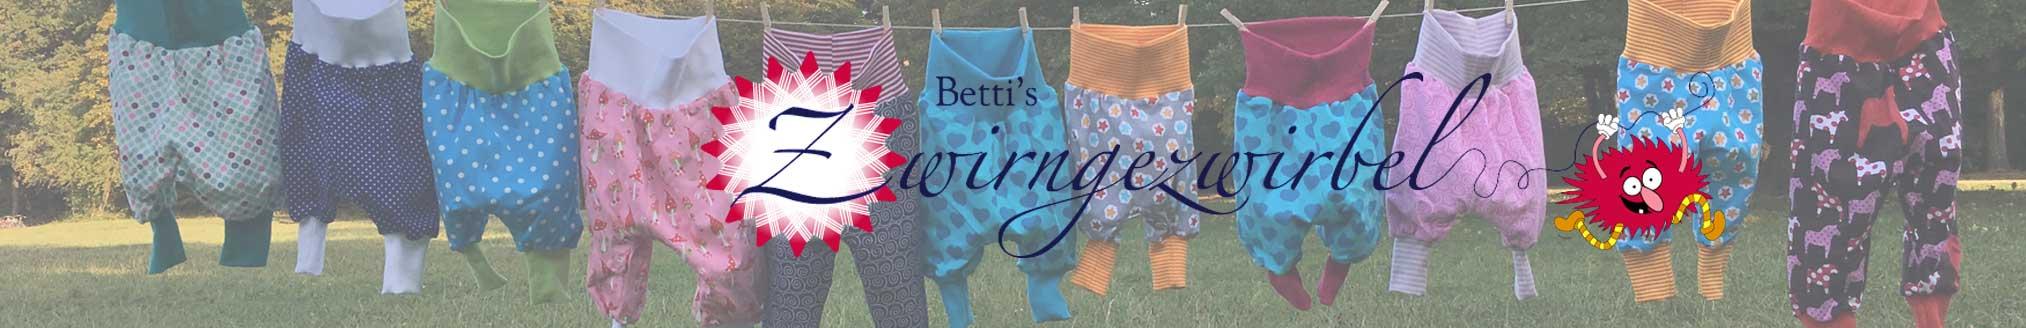 Betti's Zwirngezwirbel